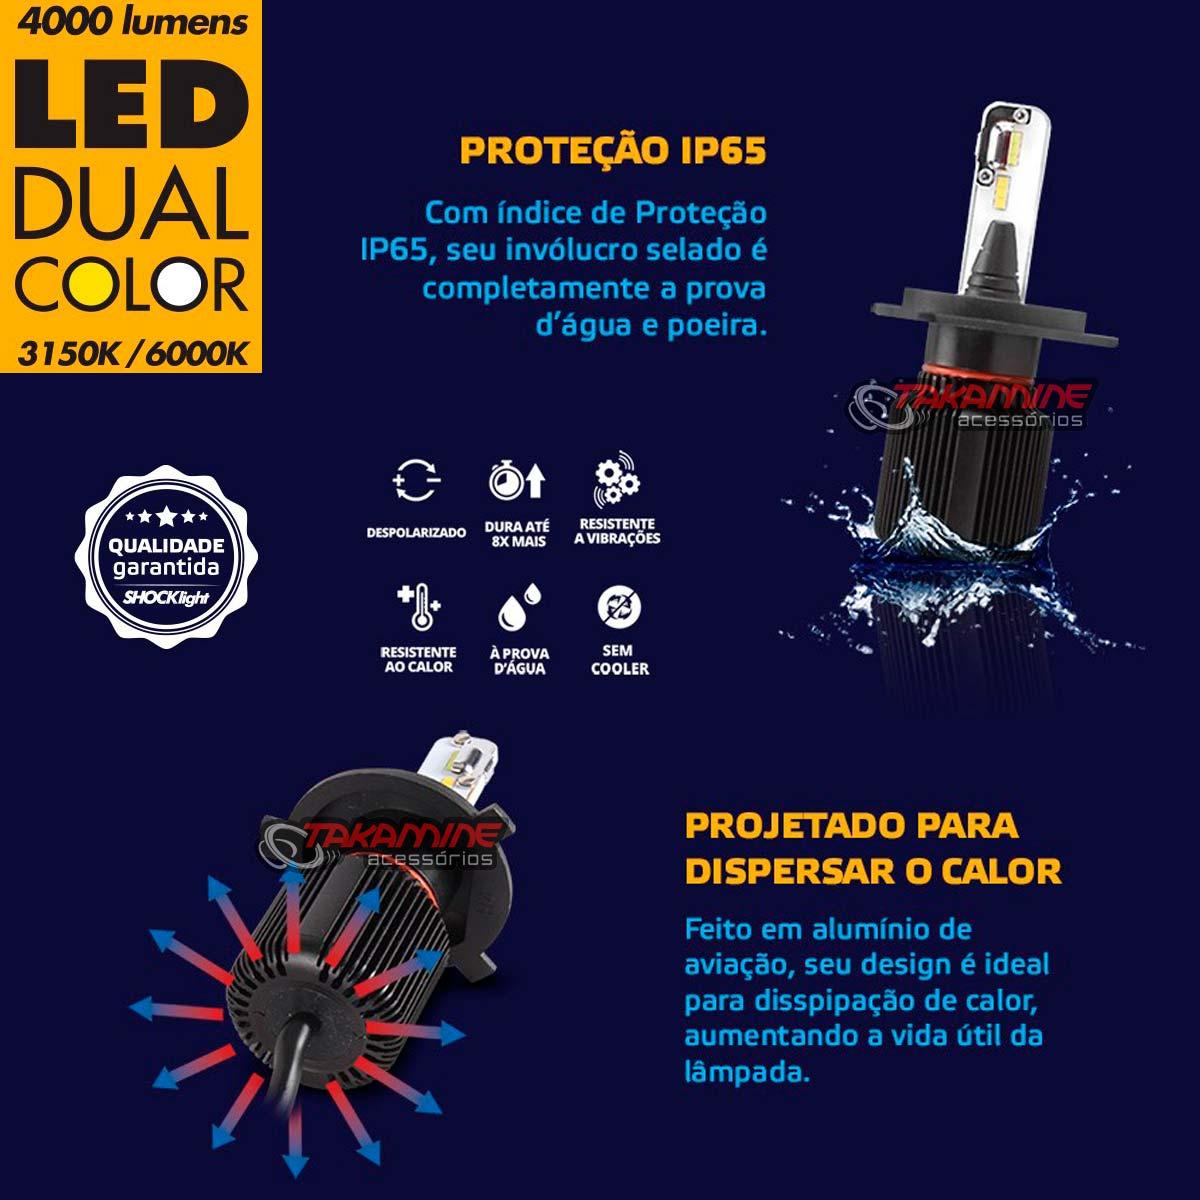 Kit de lâmpadas LED Dual Color Headlight Shocklight  tipo xenon H27 25W ilumina branco e amarelo